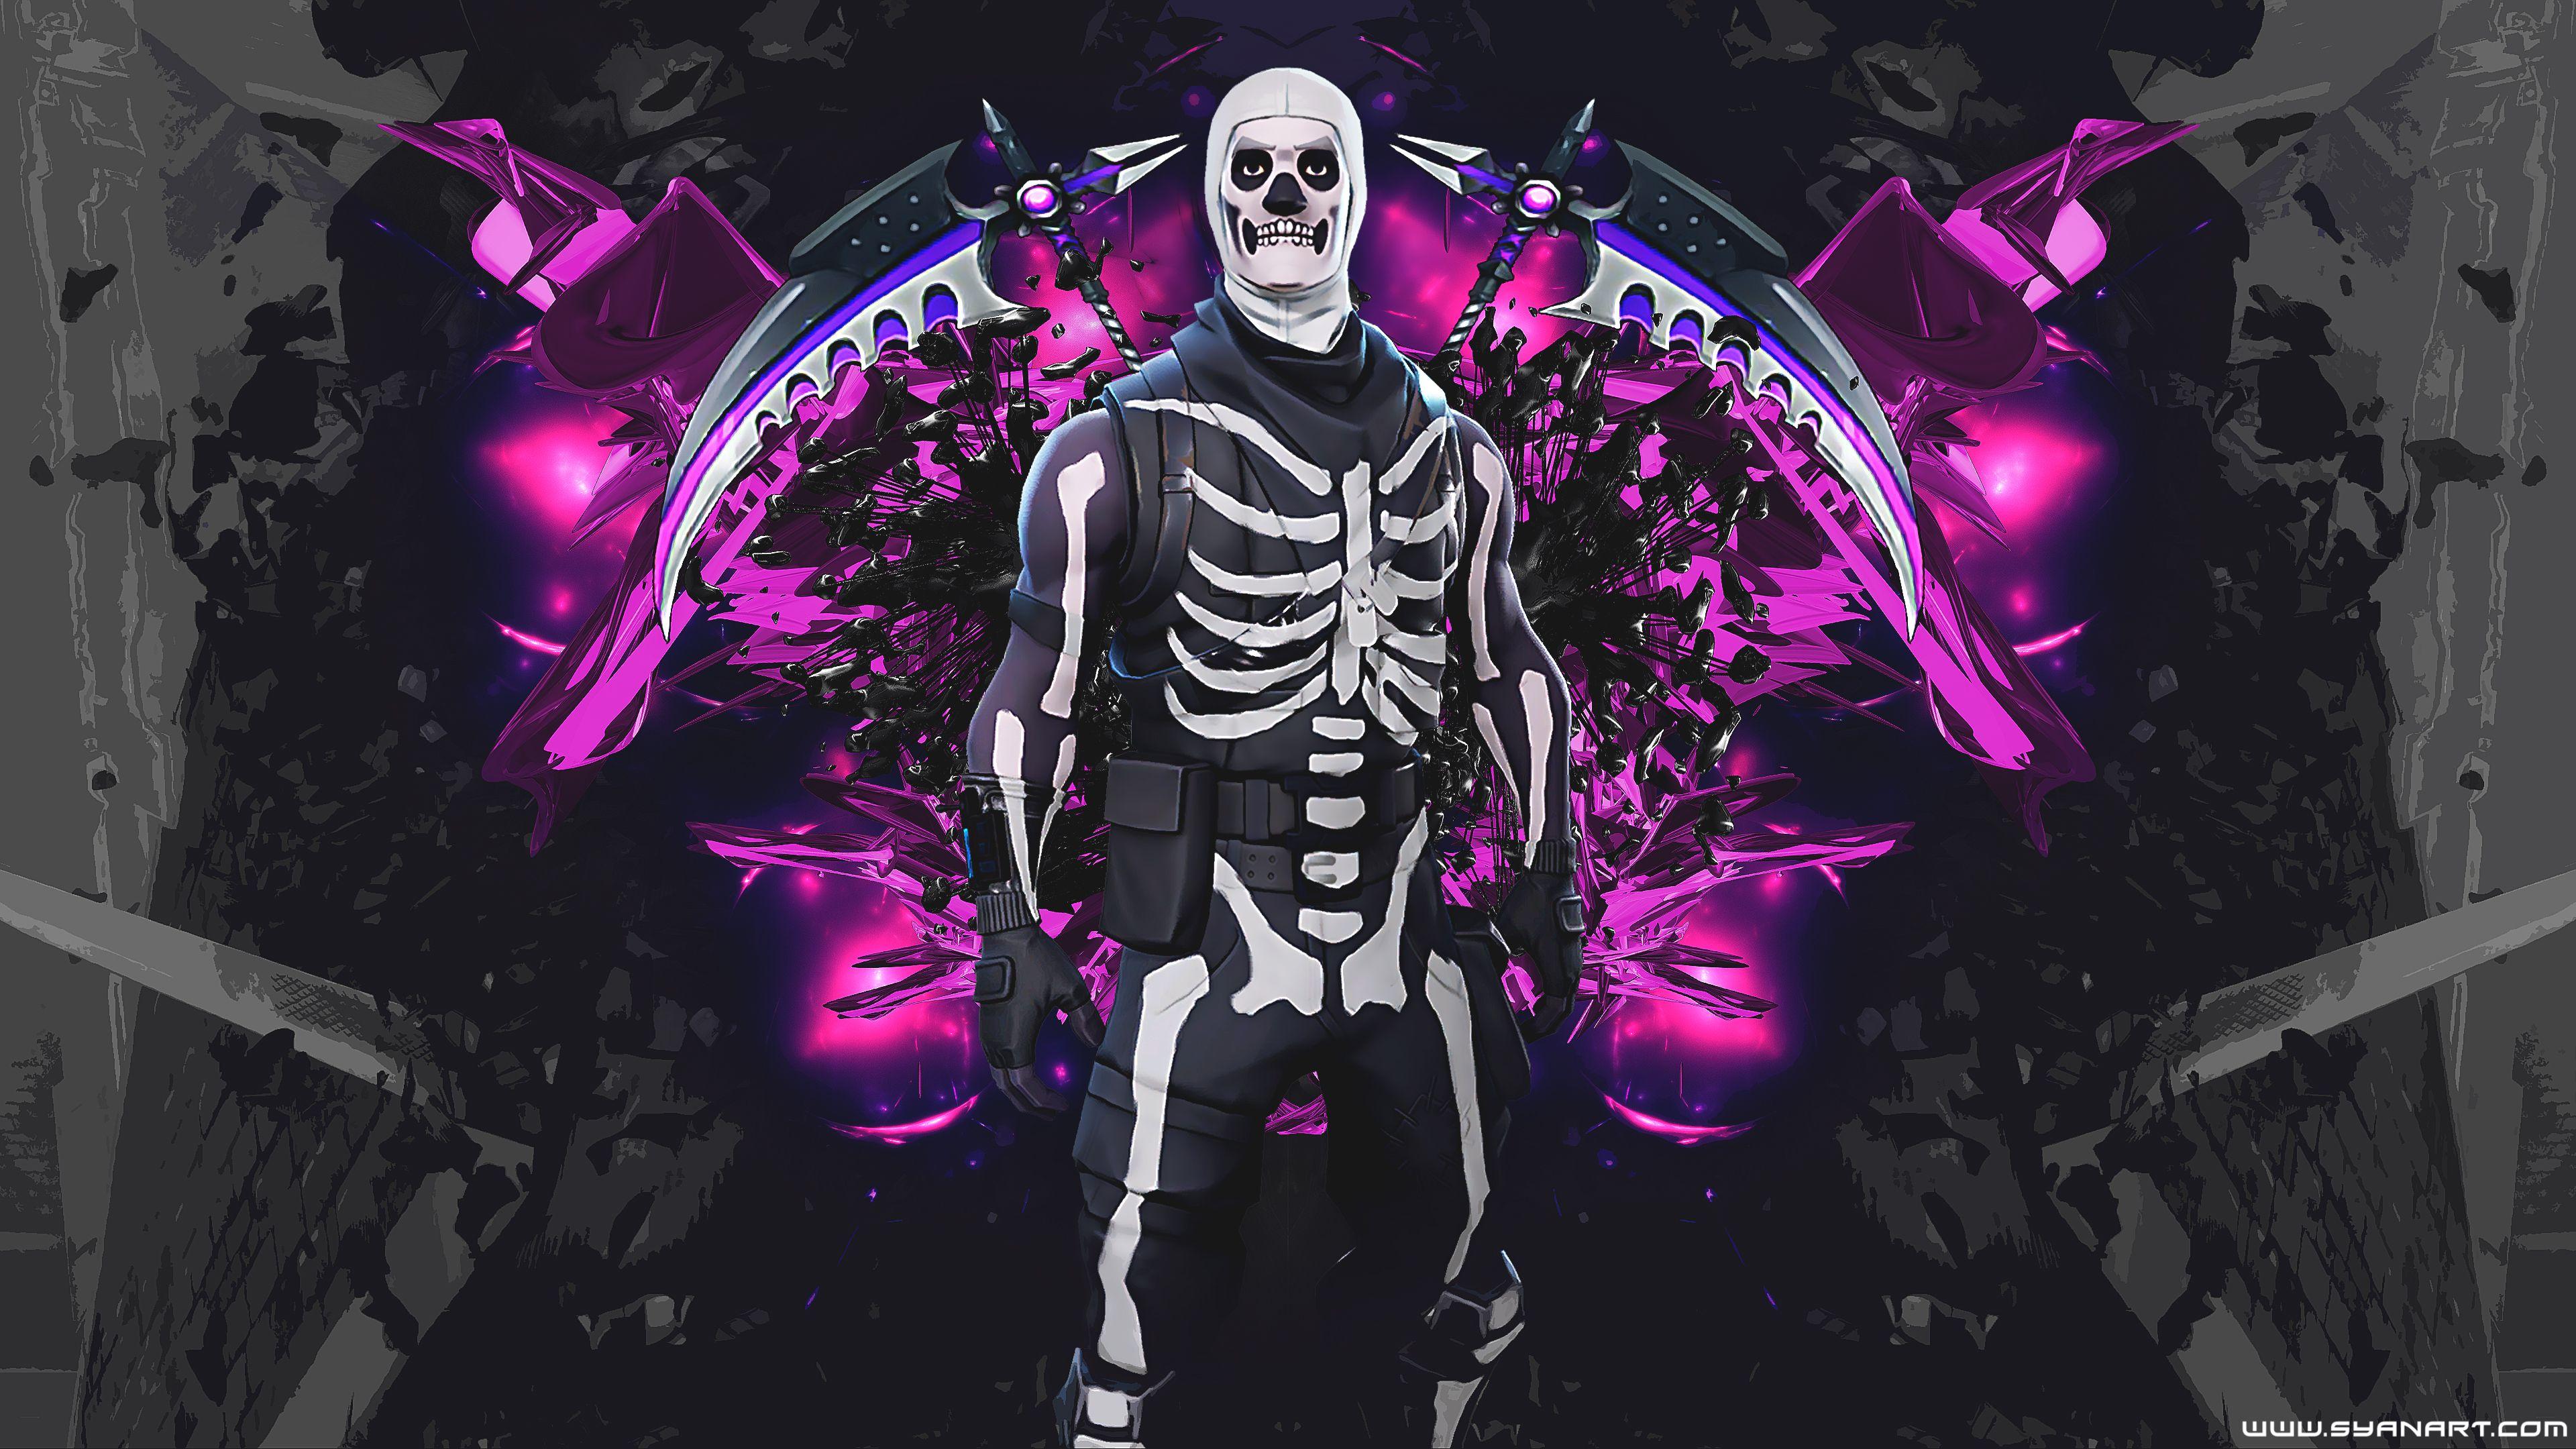 Skull Trooper Fortnite Cool Wallpapers   Top Skull Trooper 3840x2160